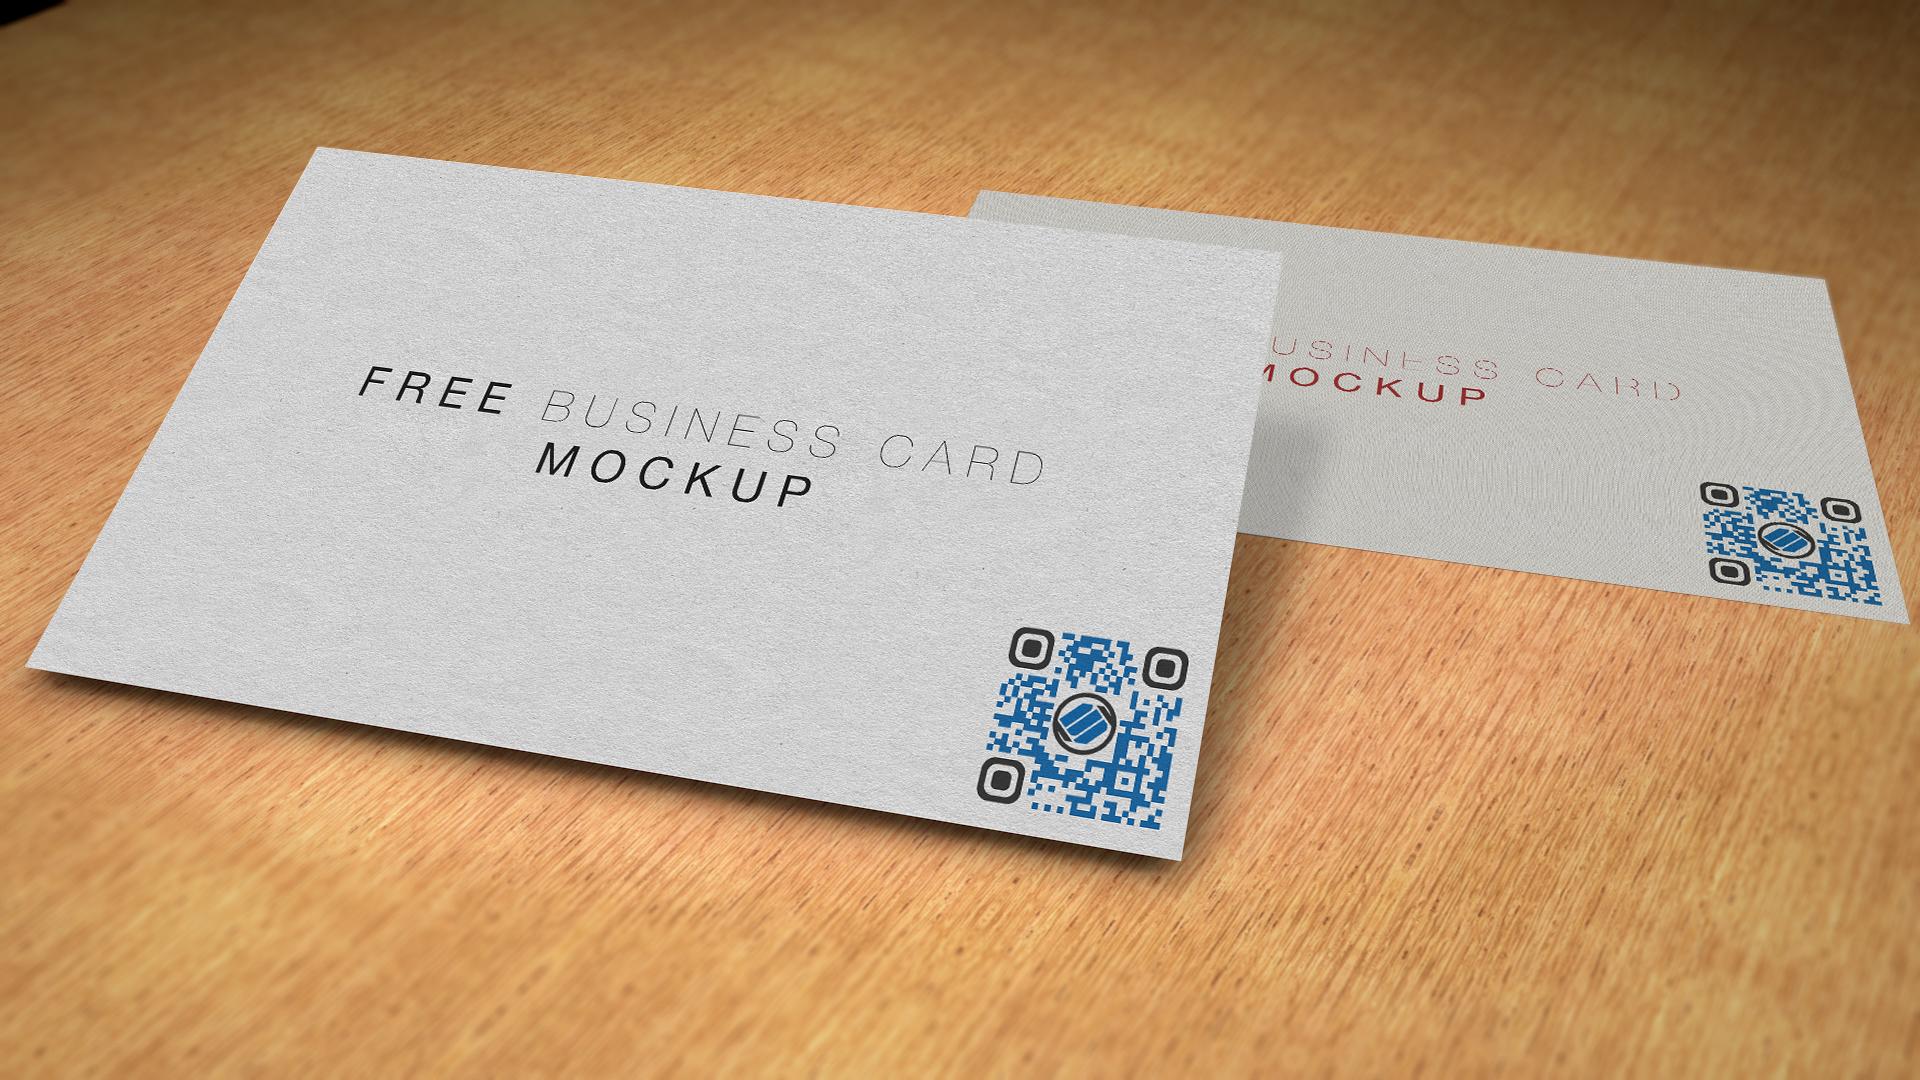 free business card mockup by szesze15 by szesze15 on deviantart